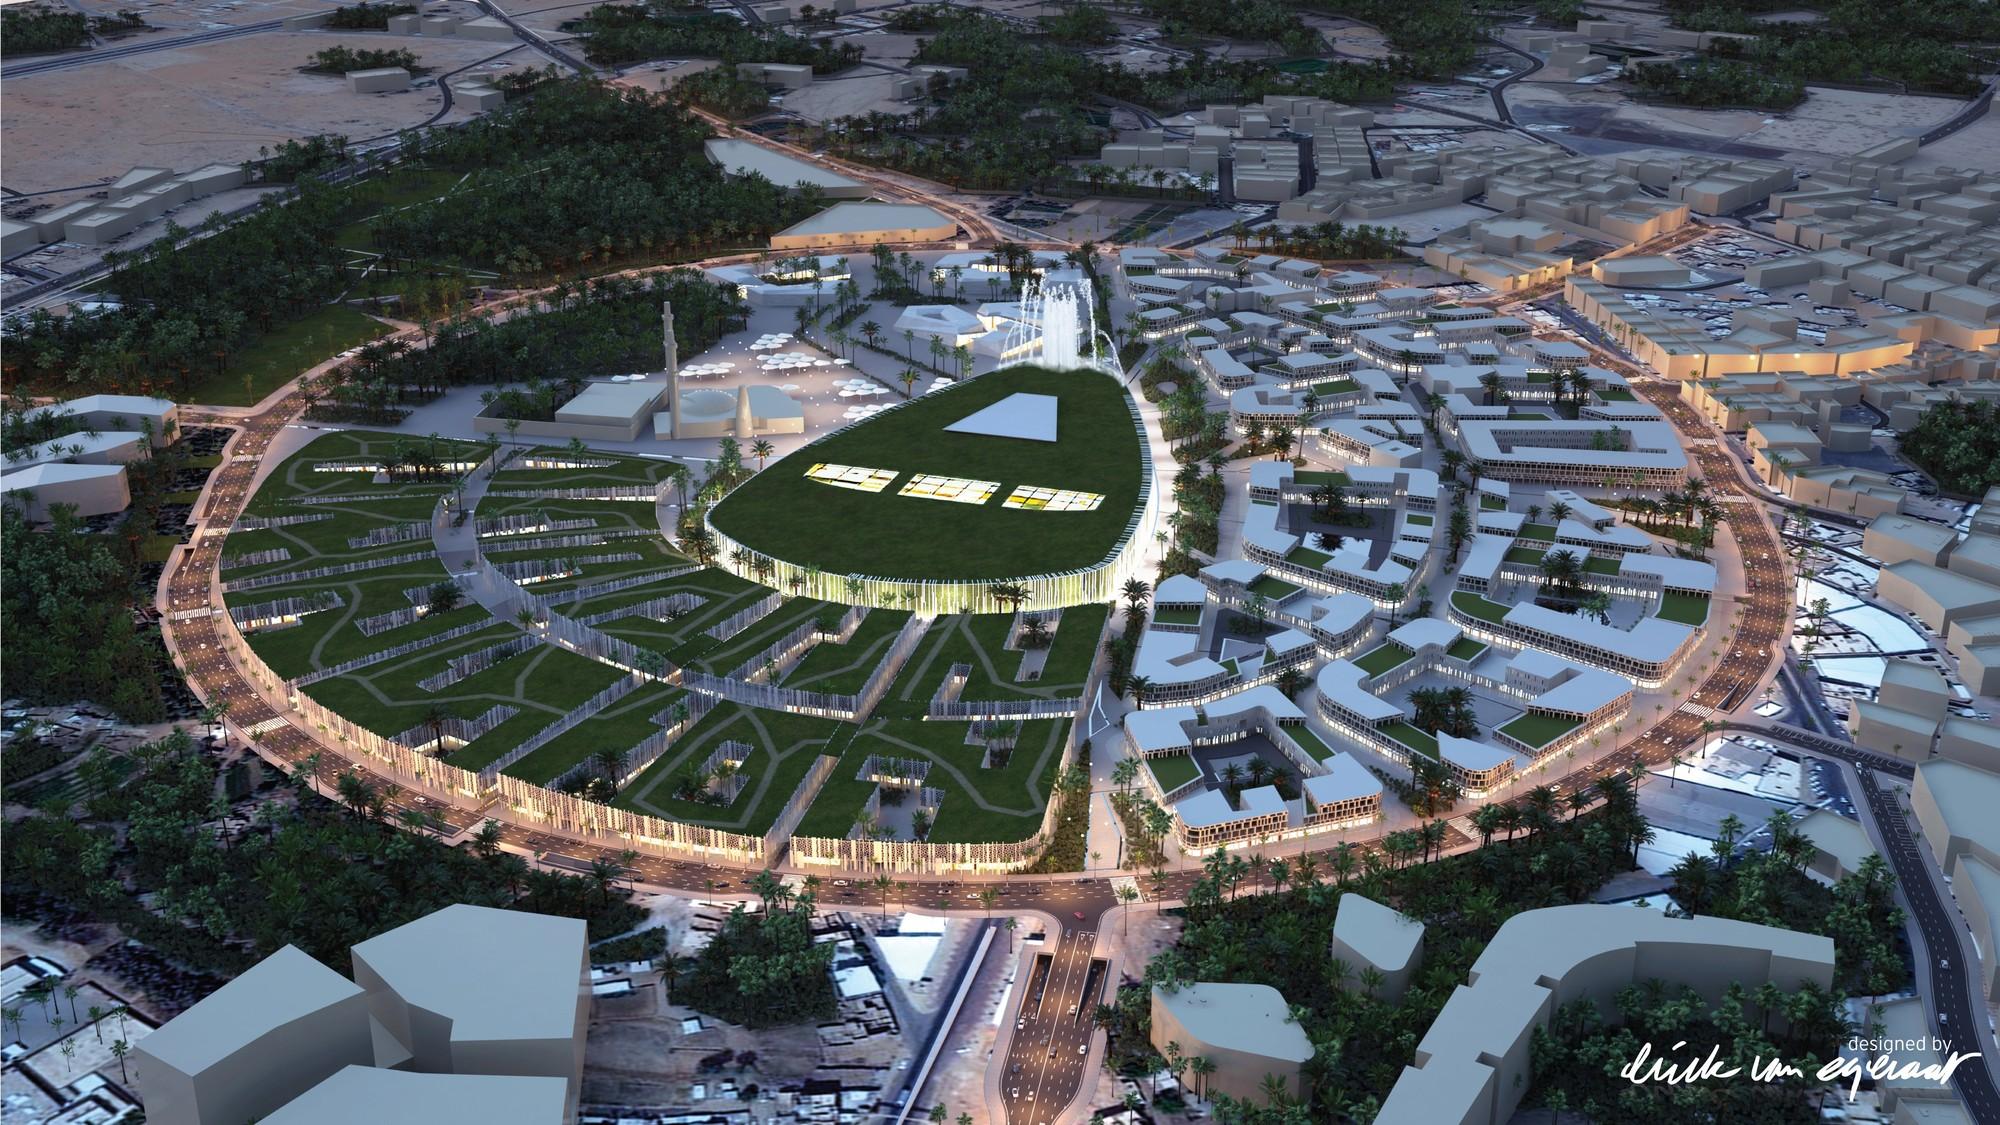 Erick van Egeraat propõe centro urbano exclusivo para pedestres na Arábia Saudita, Aerial View. Image © (designed by) Erick van Egeraat BV